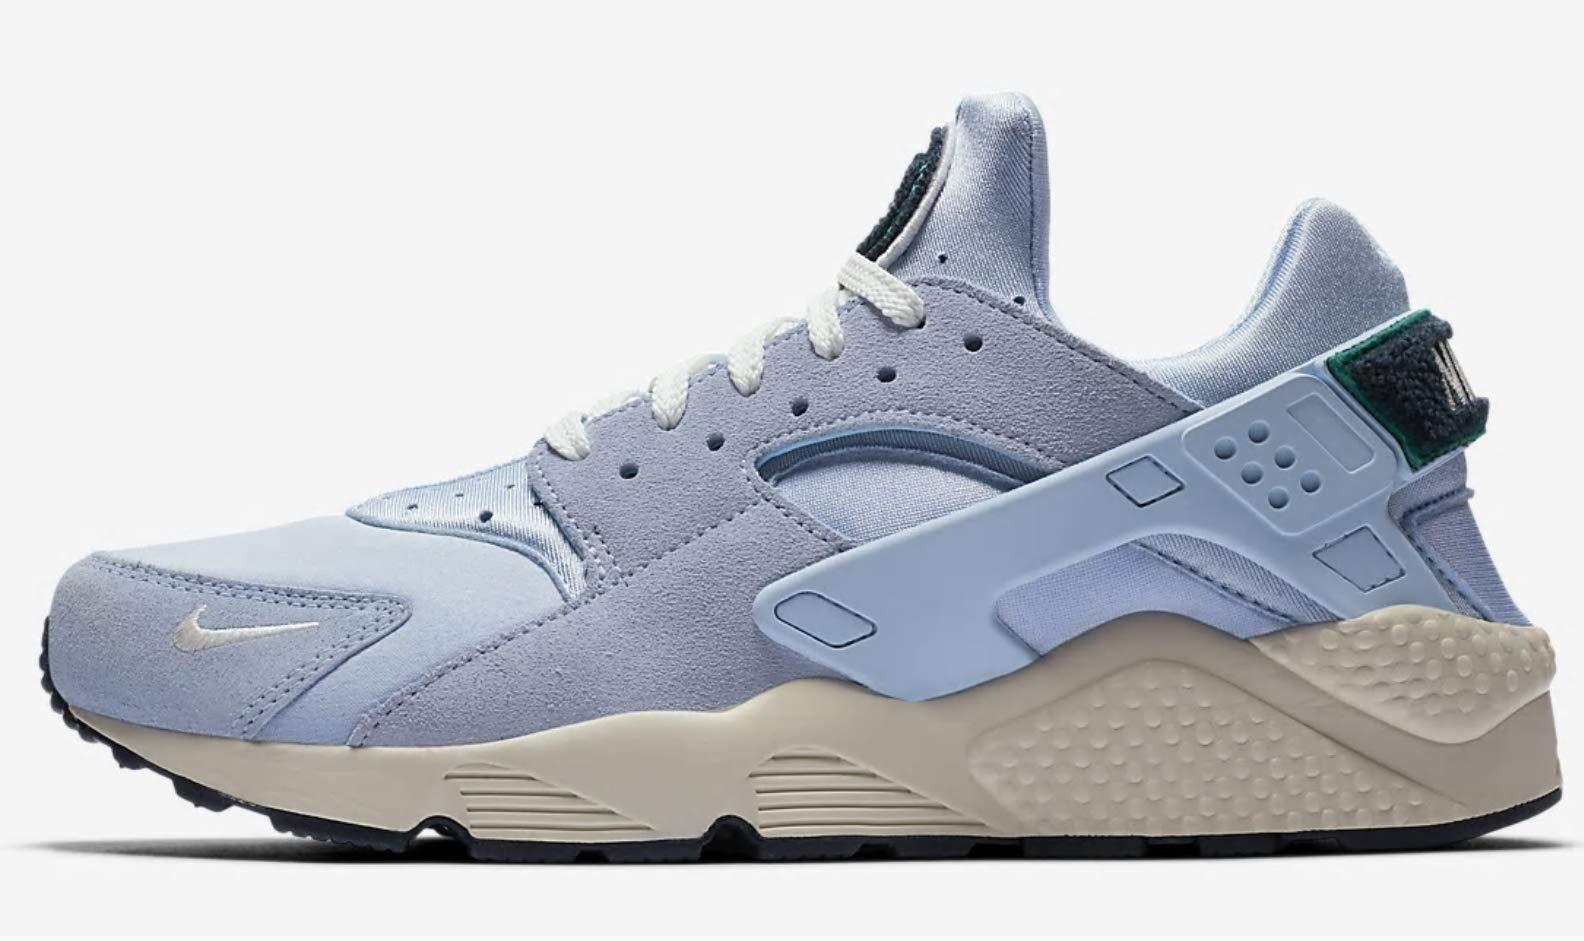 quality design 80c5e c160c Galleon - Nike Air Huarache Run PRM Mens 704830-403 Size 7